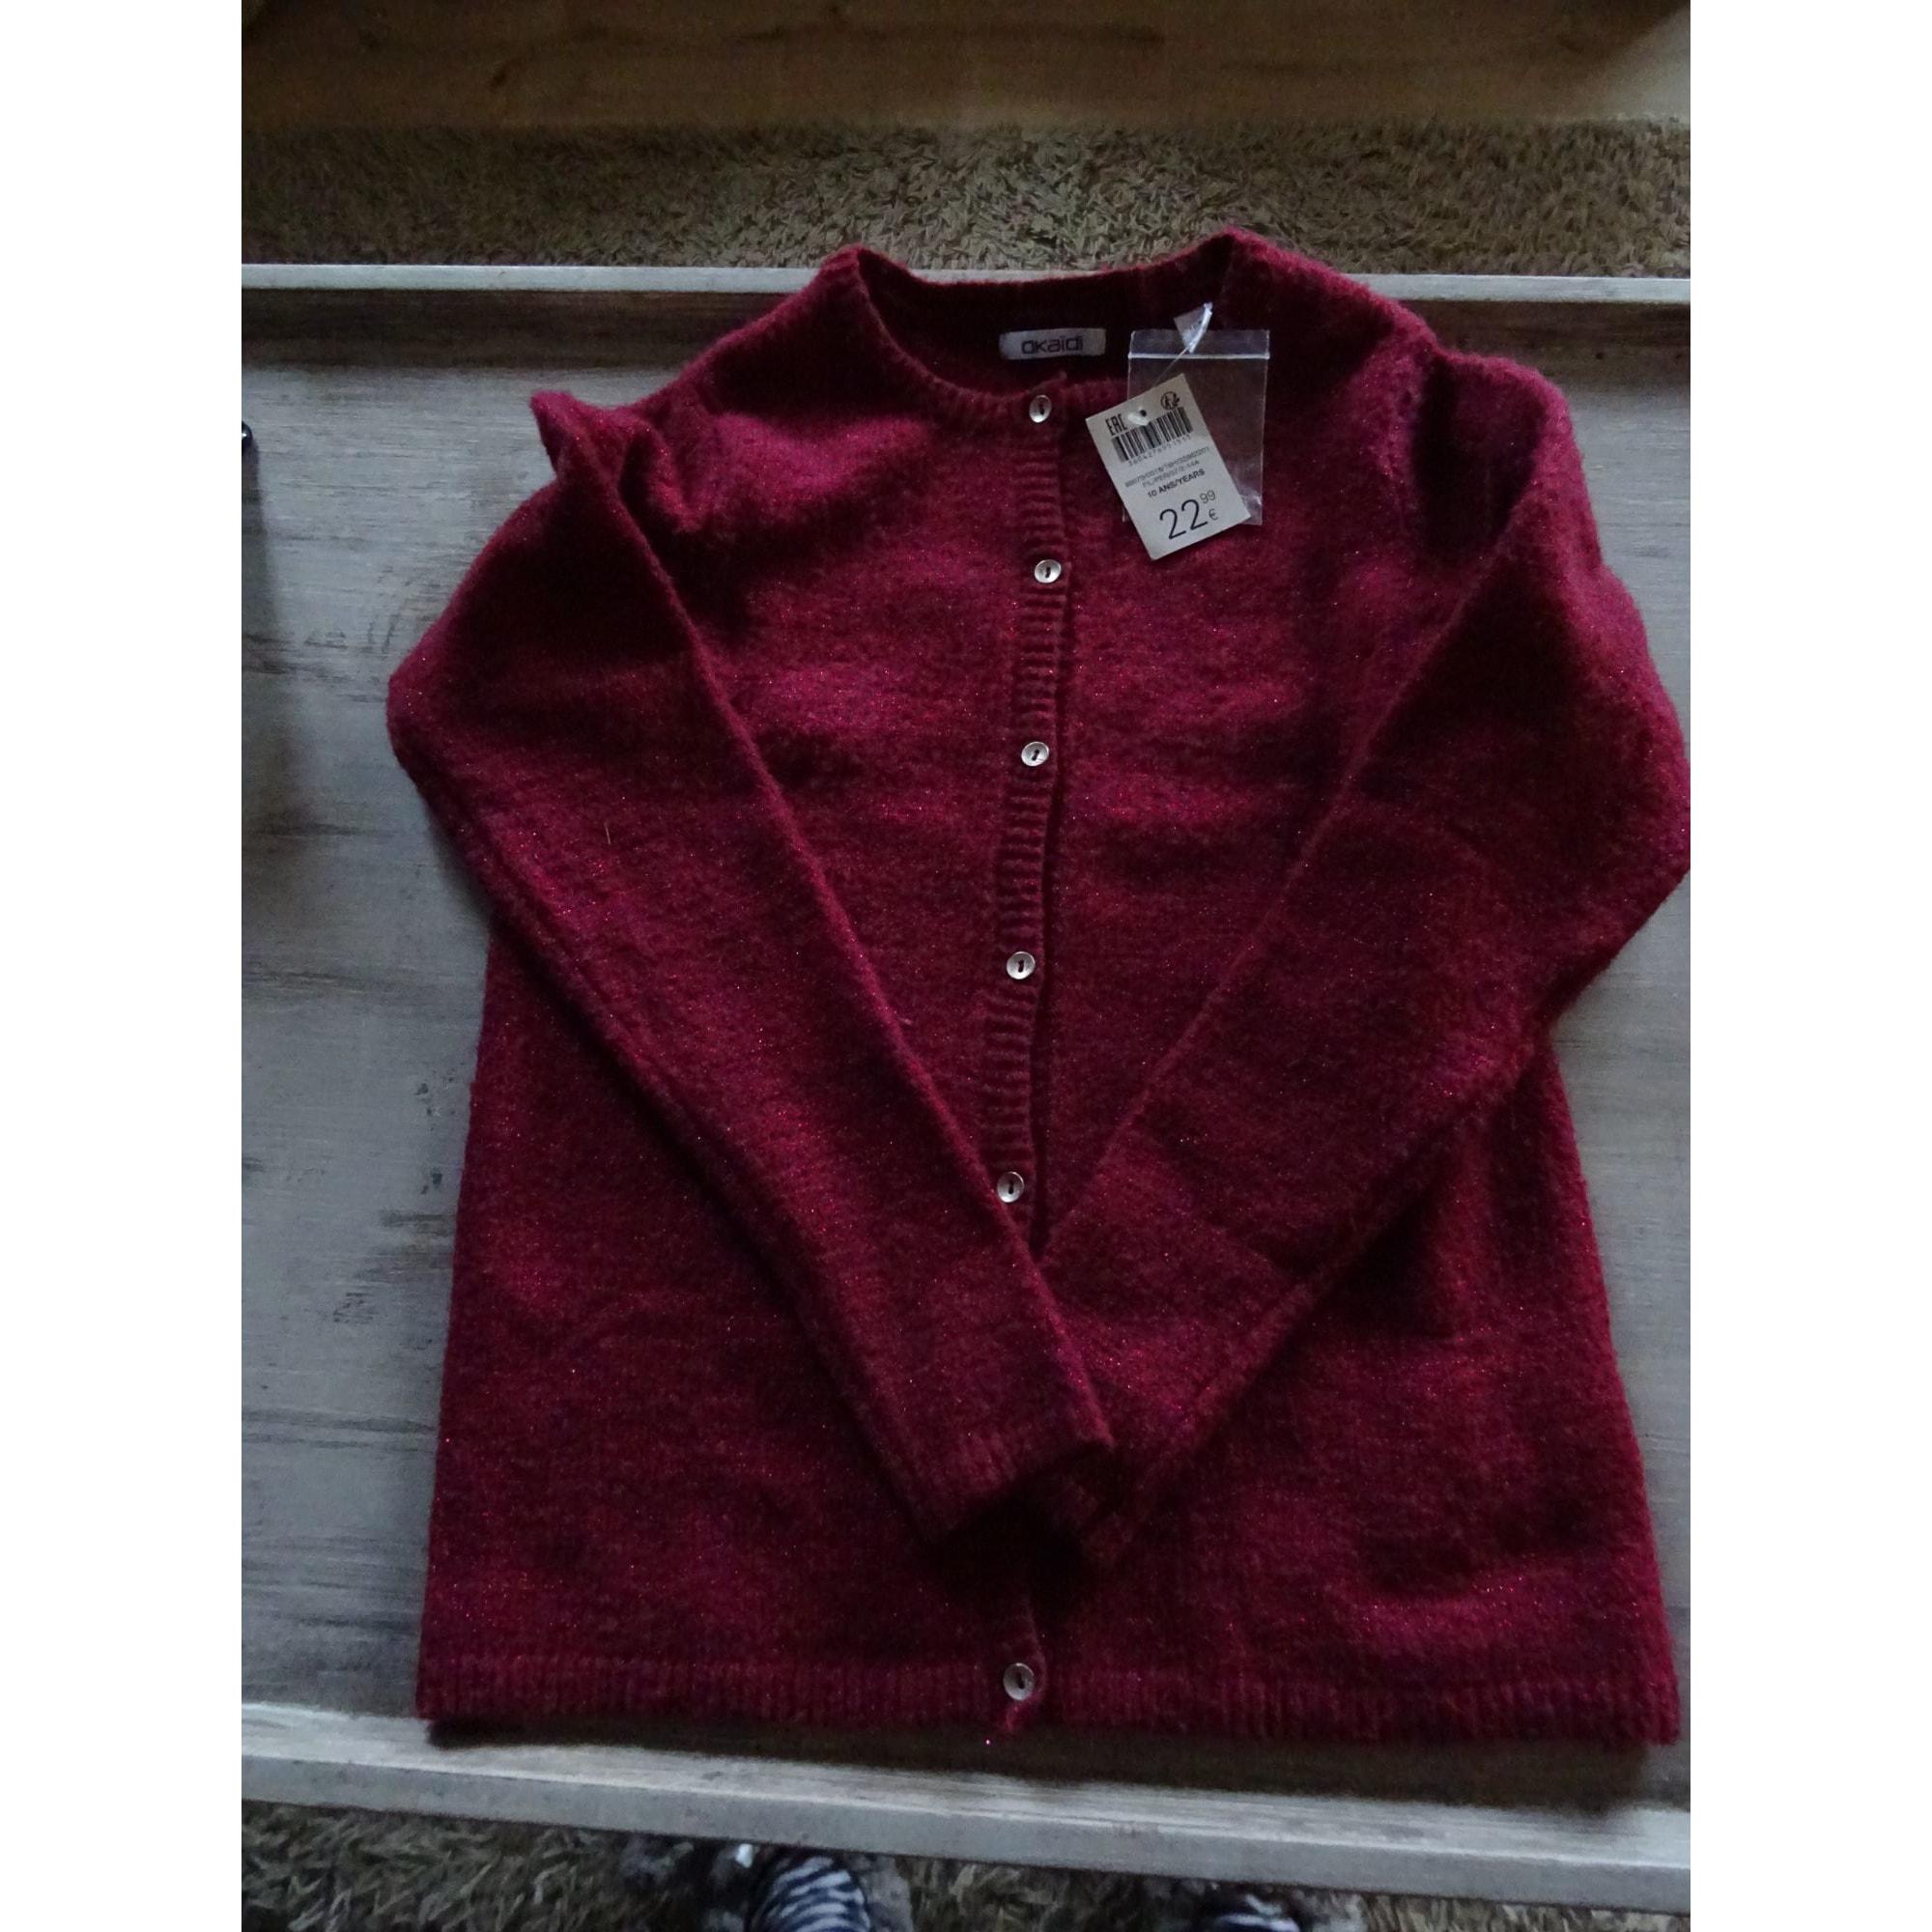 Gilet, cardigan OKAÏDI Rouge, bordeaux